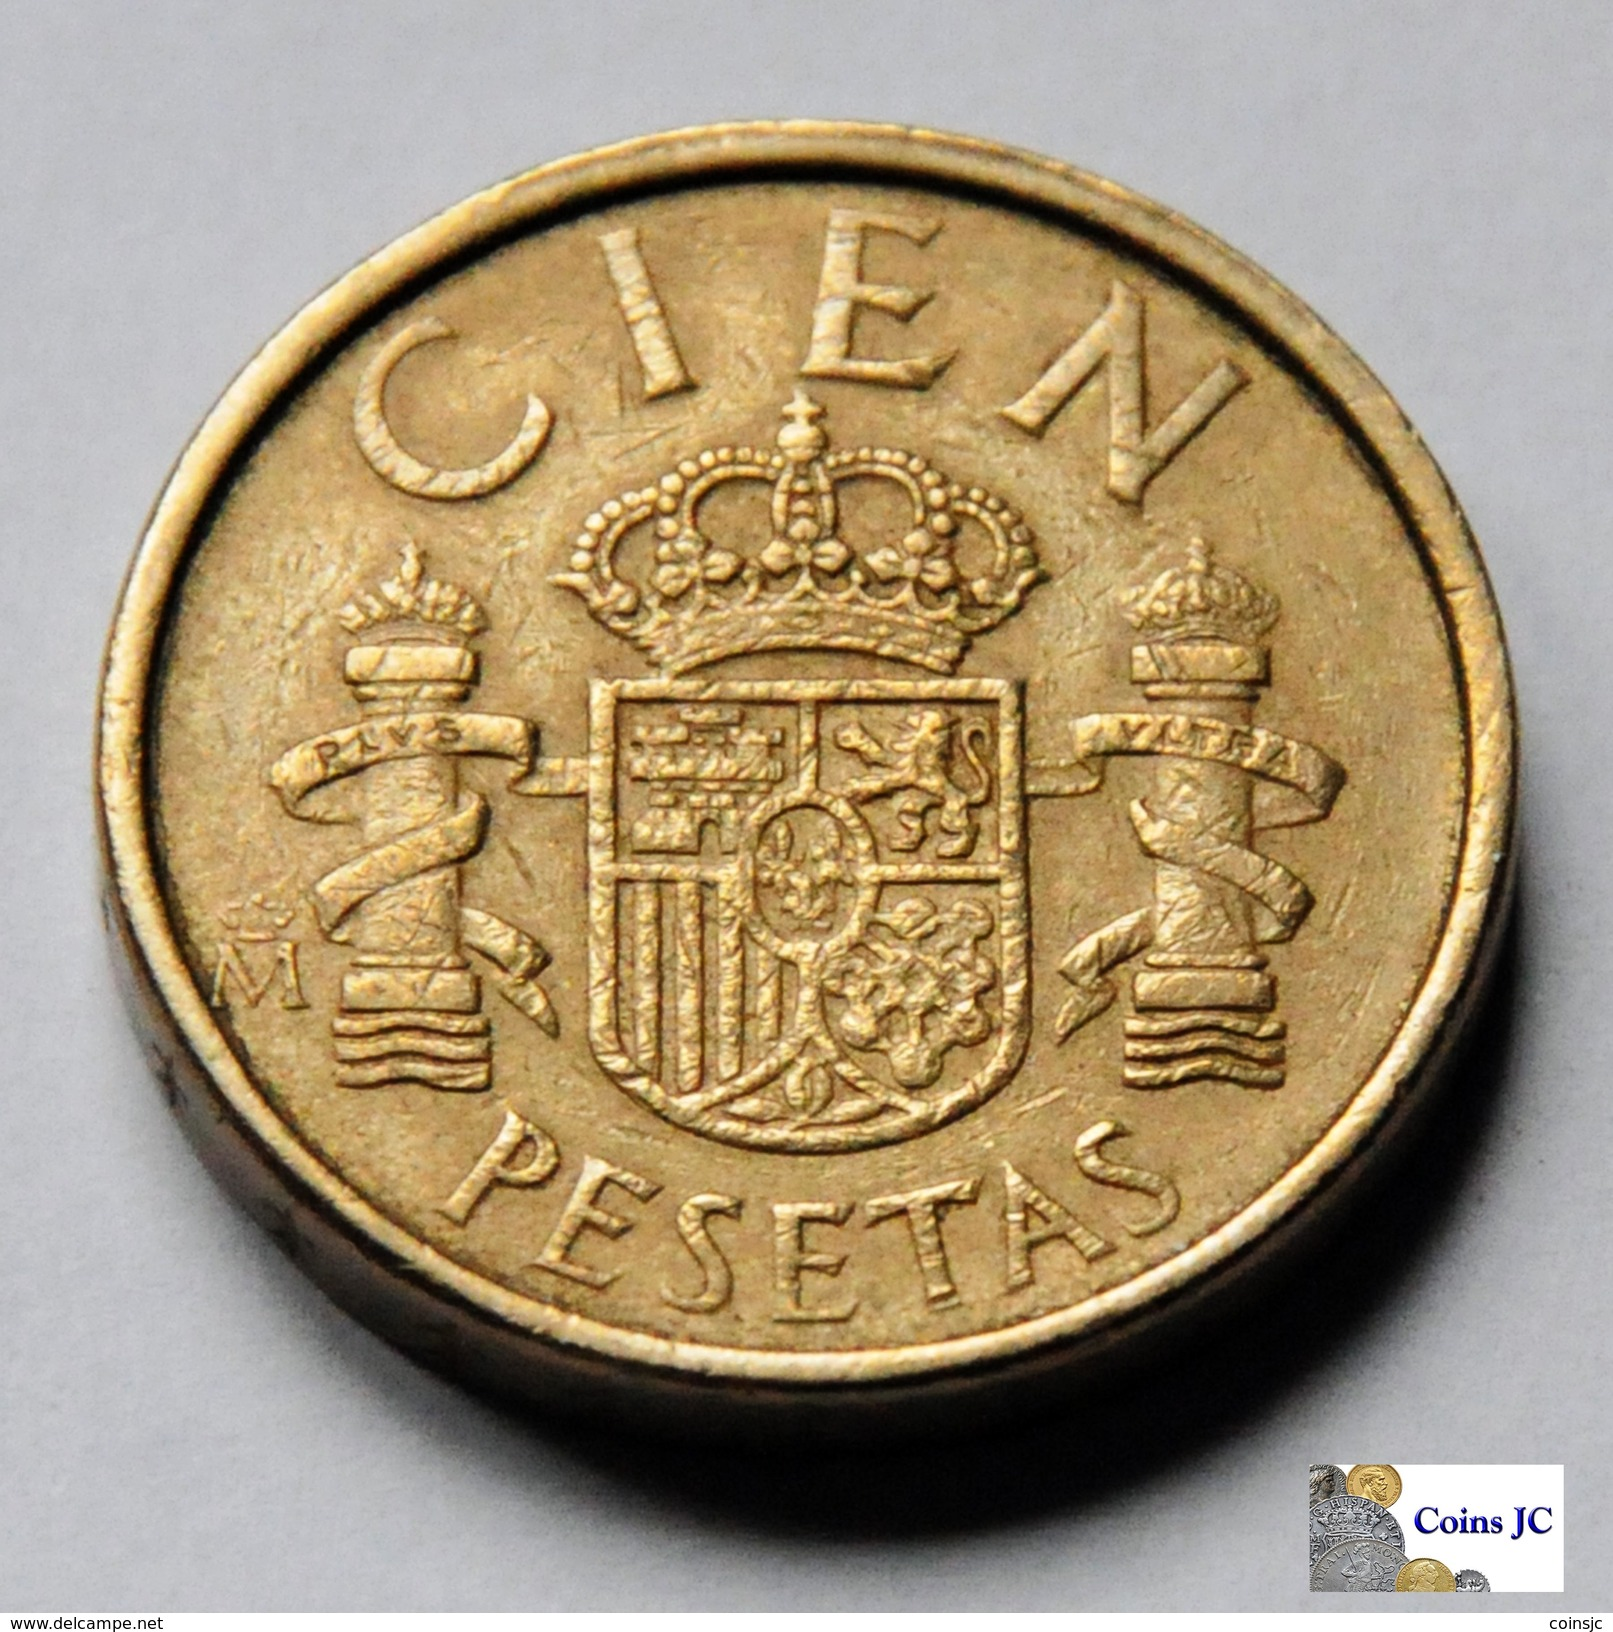 España - 100 Pesetas - 1990 - 100 Pesetas